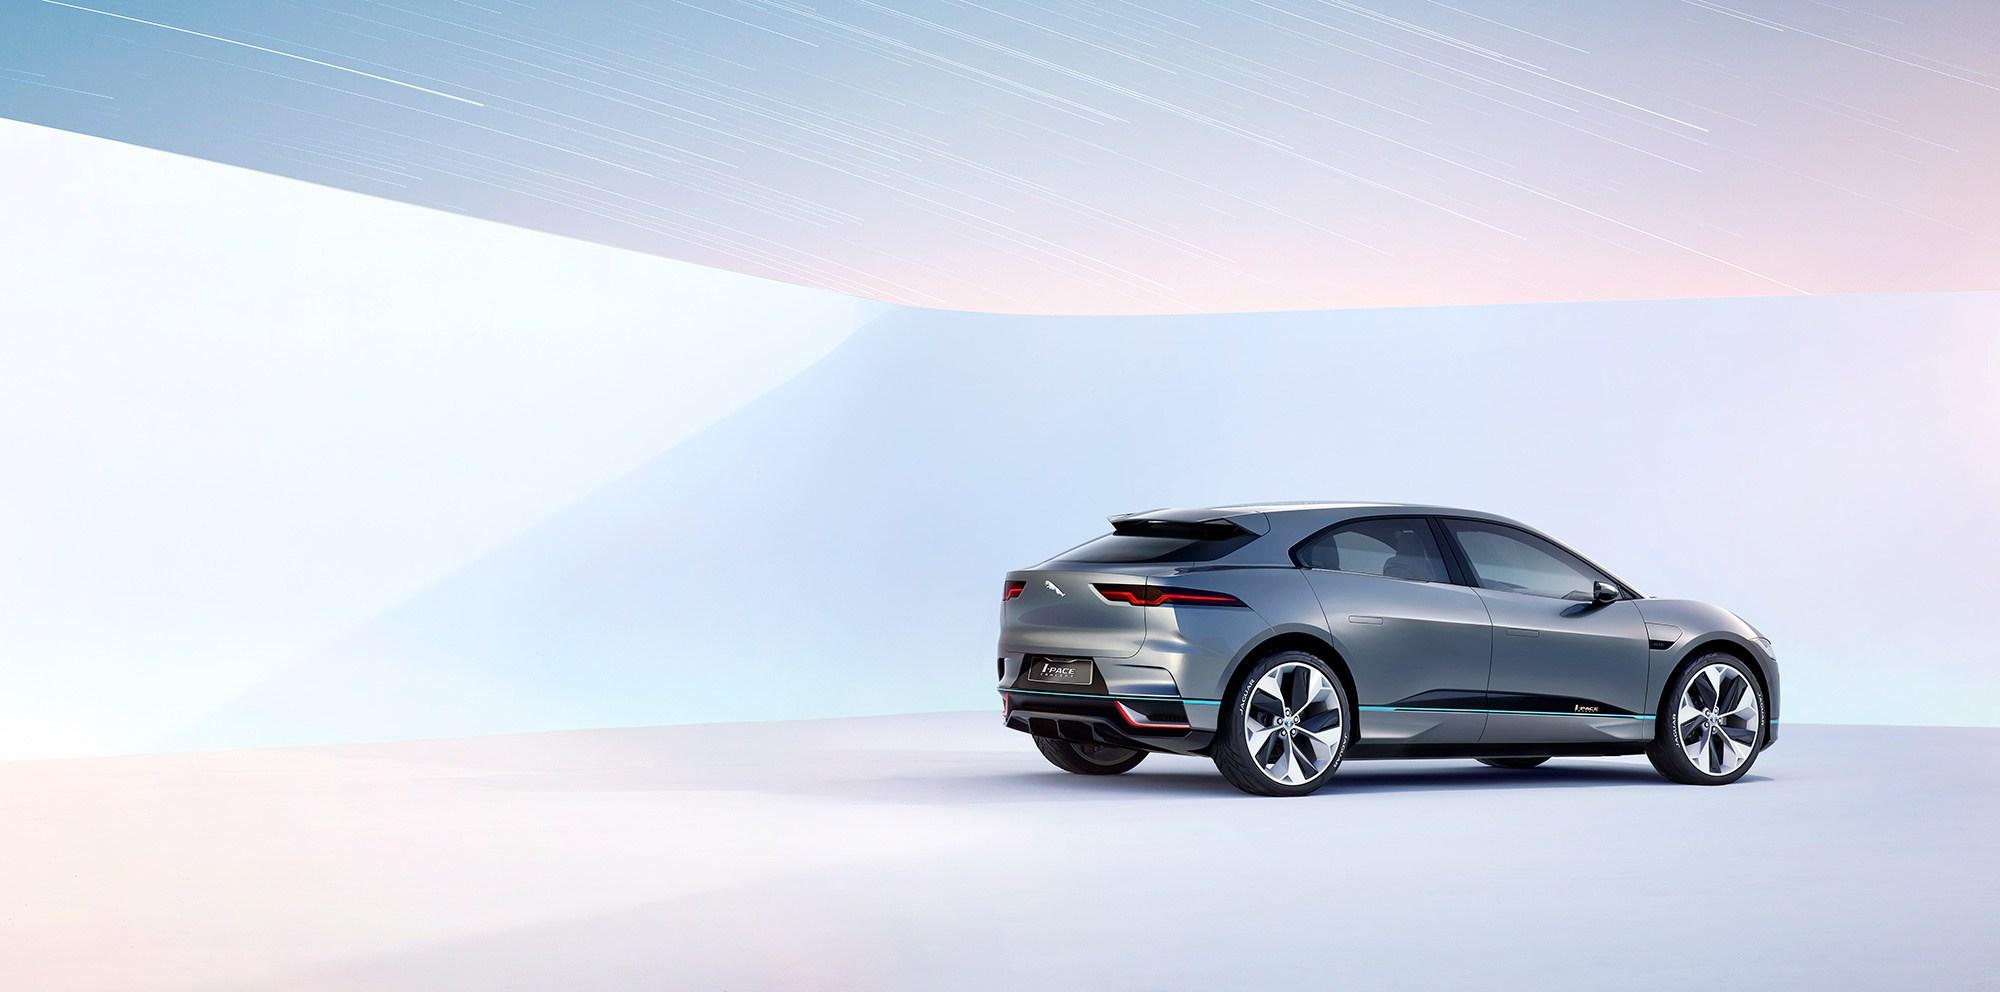 I-PACE : Το πρώτο ηλεκτρικό SUV της Jaguar!